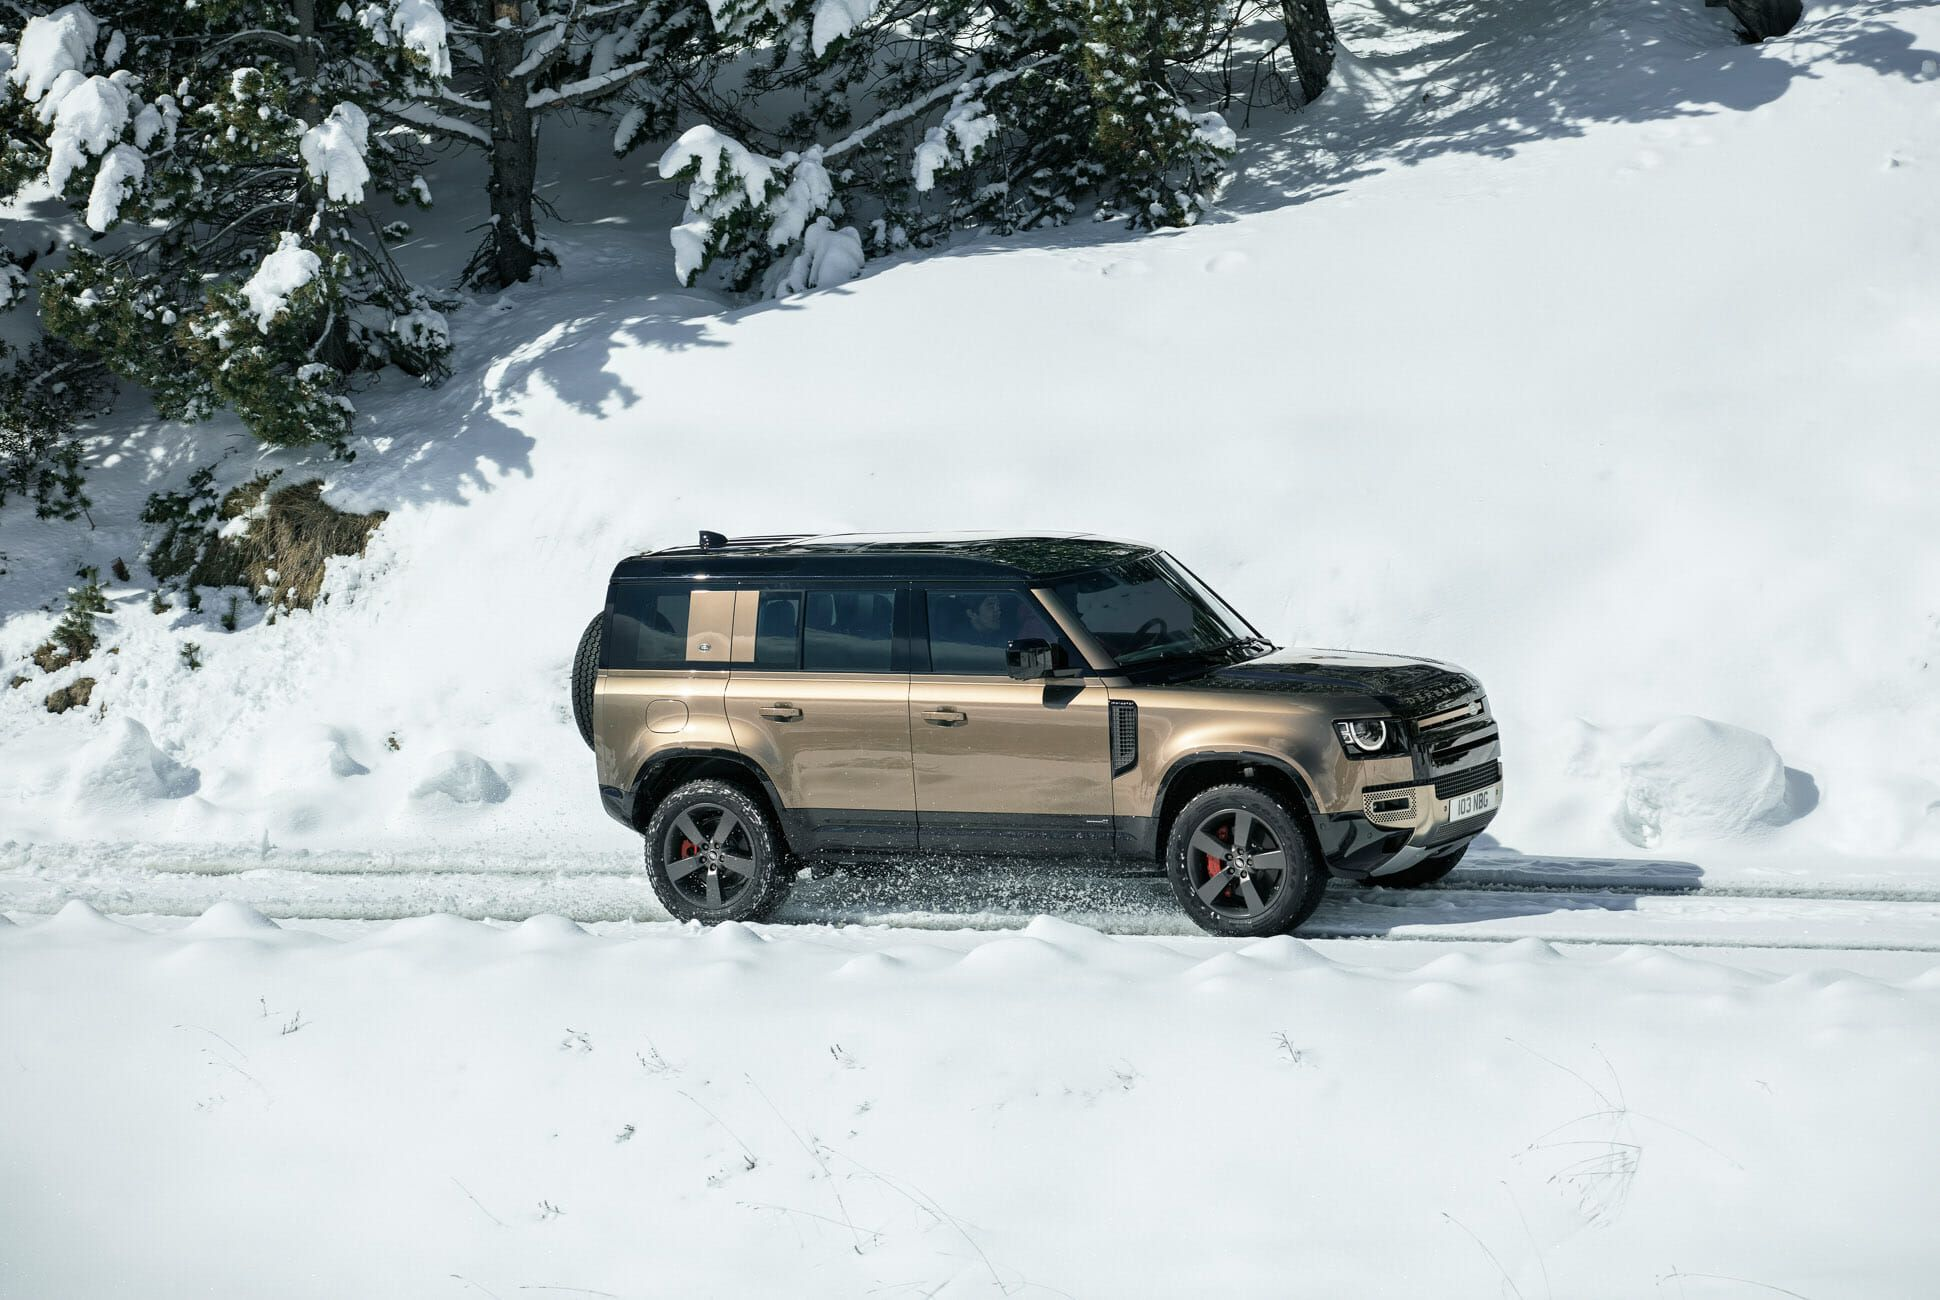 Land Rover Defender Gear Patrol-Exterior Action-Slide-27